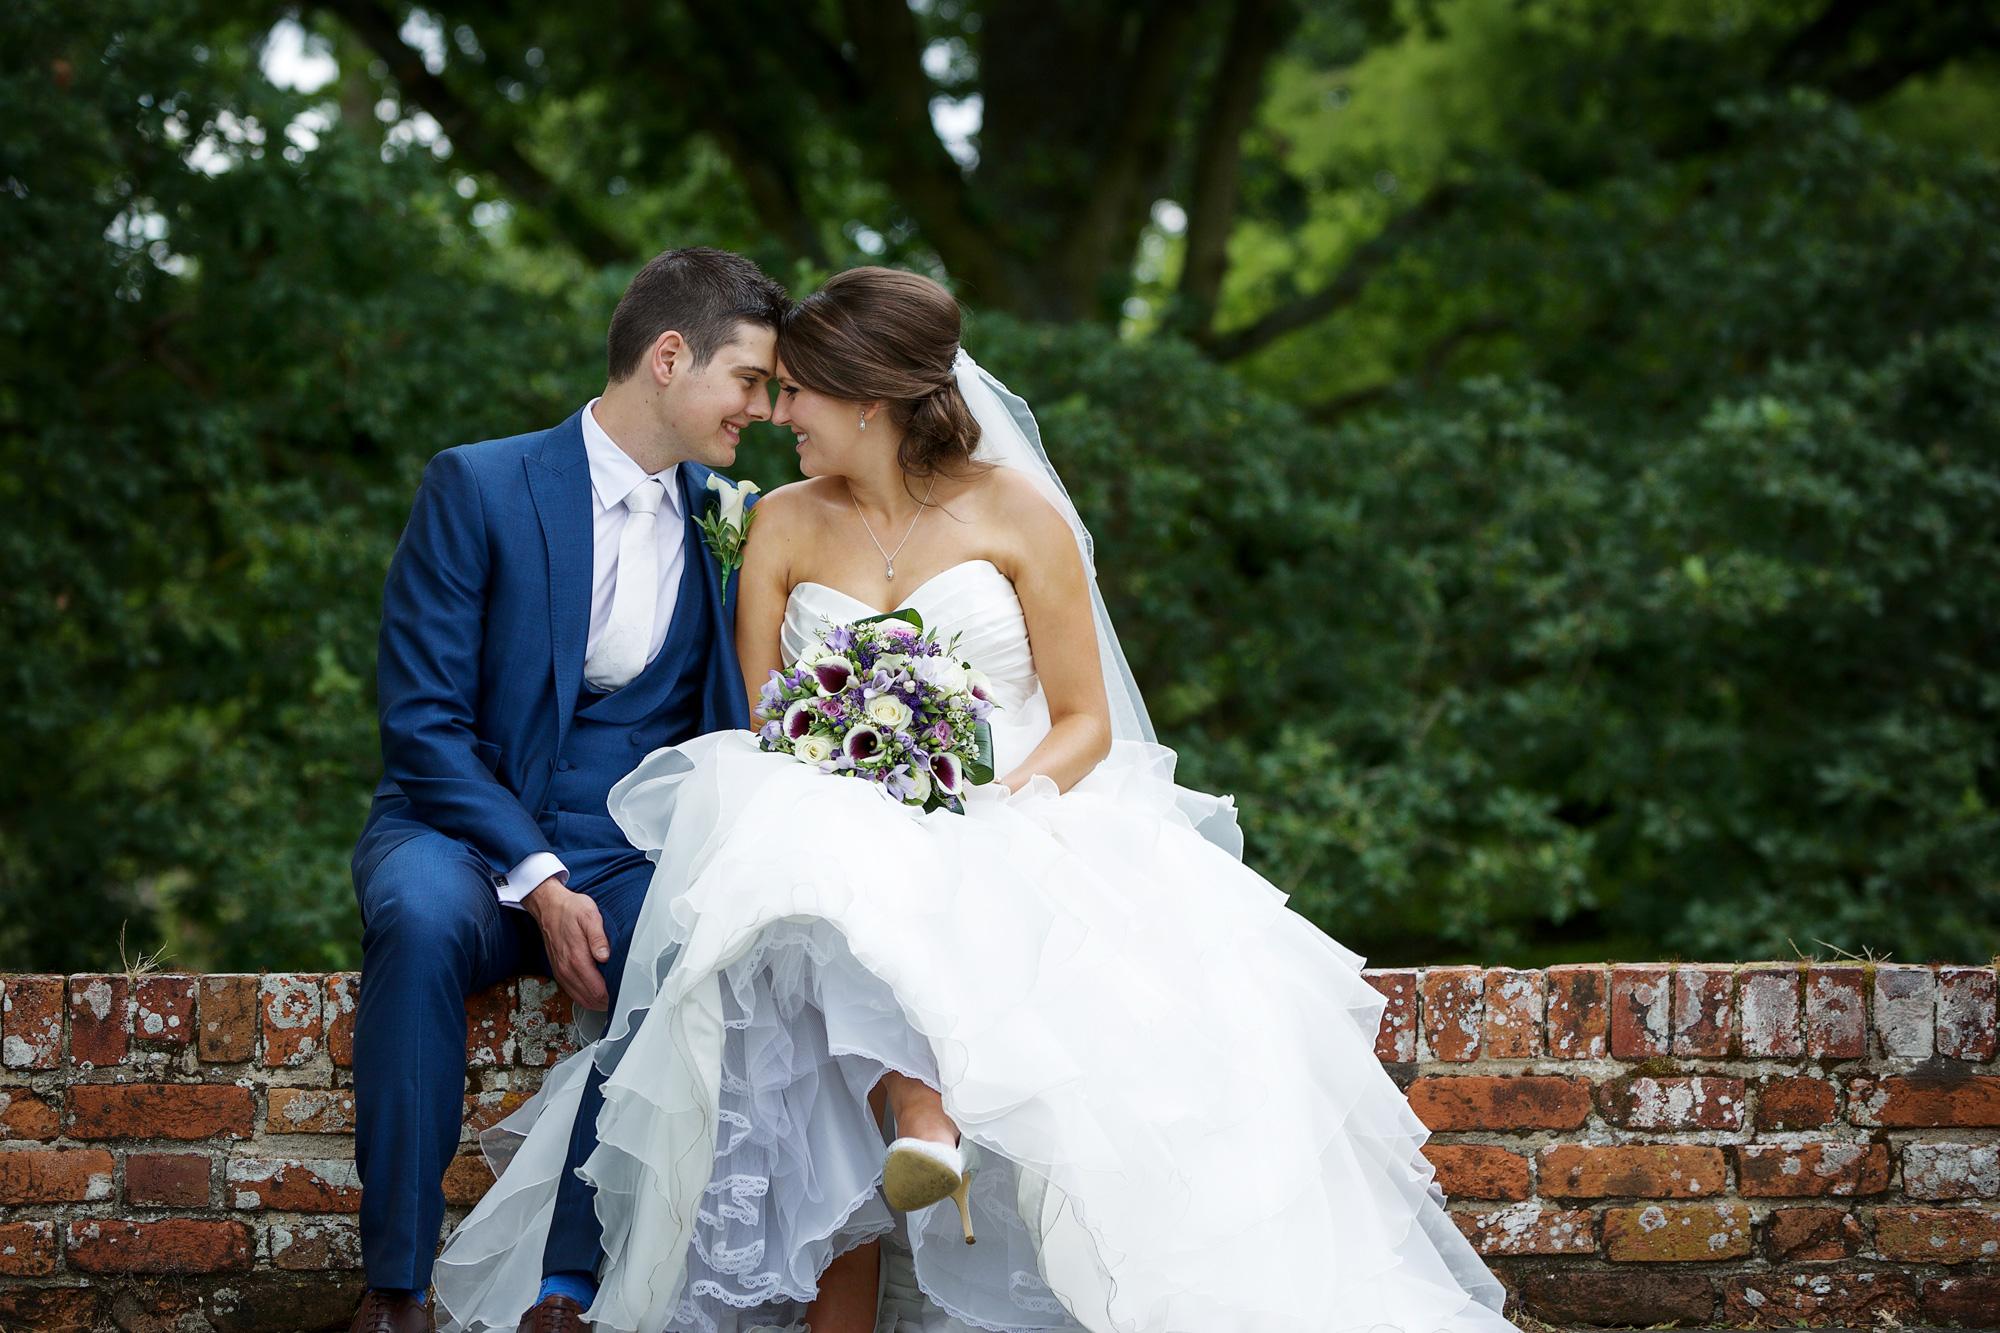 Adam_Hillier_Wedding_Photographer_Newbury_Berkshire_8 (5).jpg